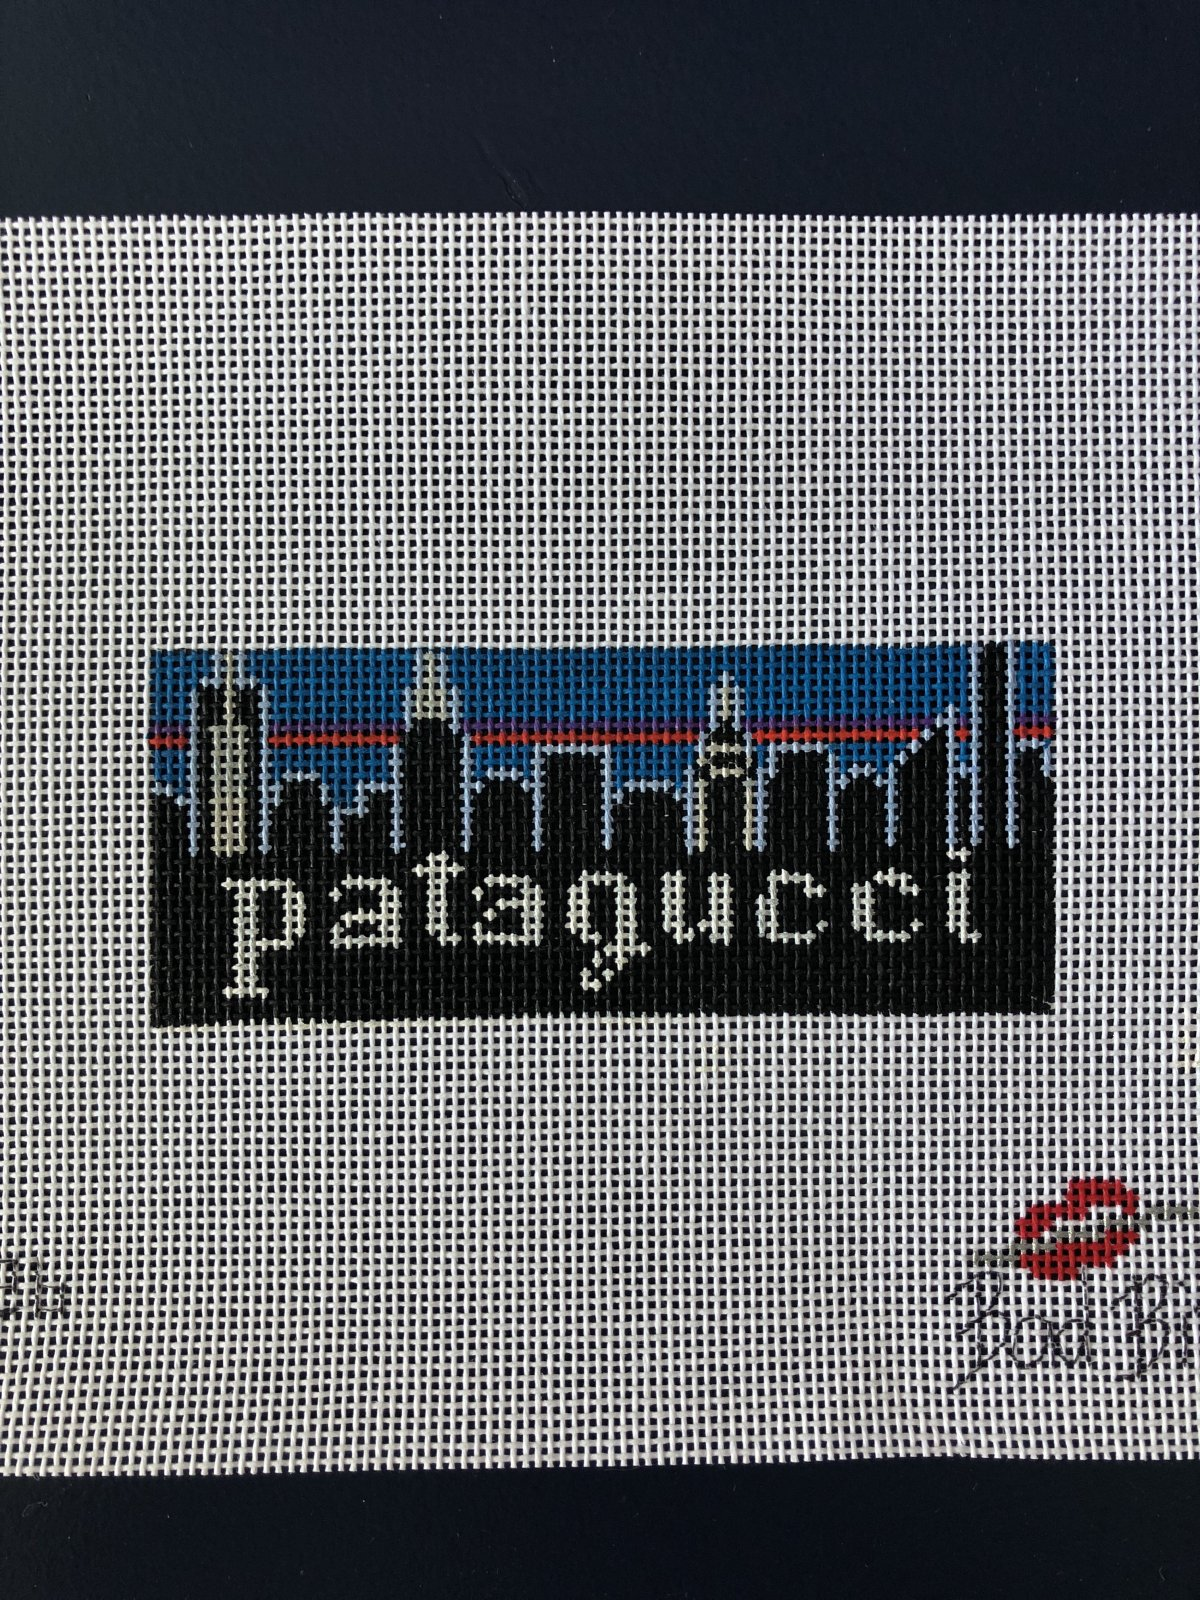 Patagucci by Bad Bitch Needlepoint  - New York Skyline